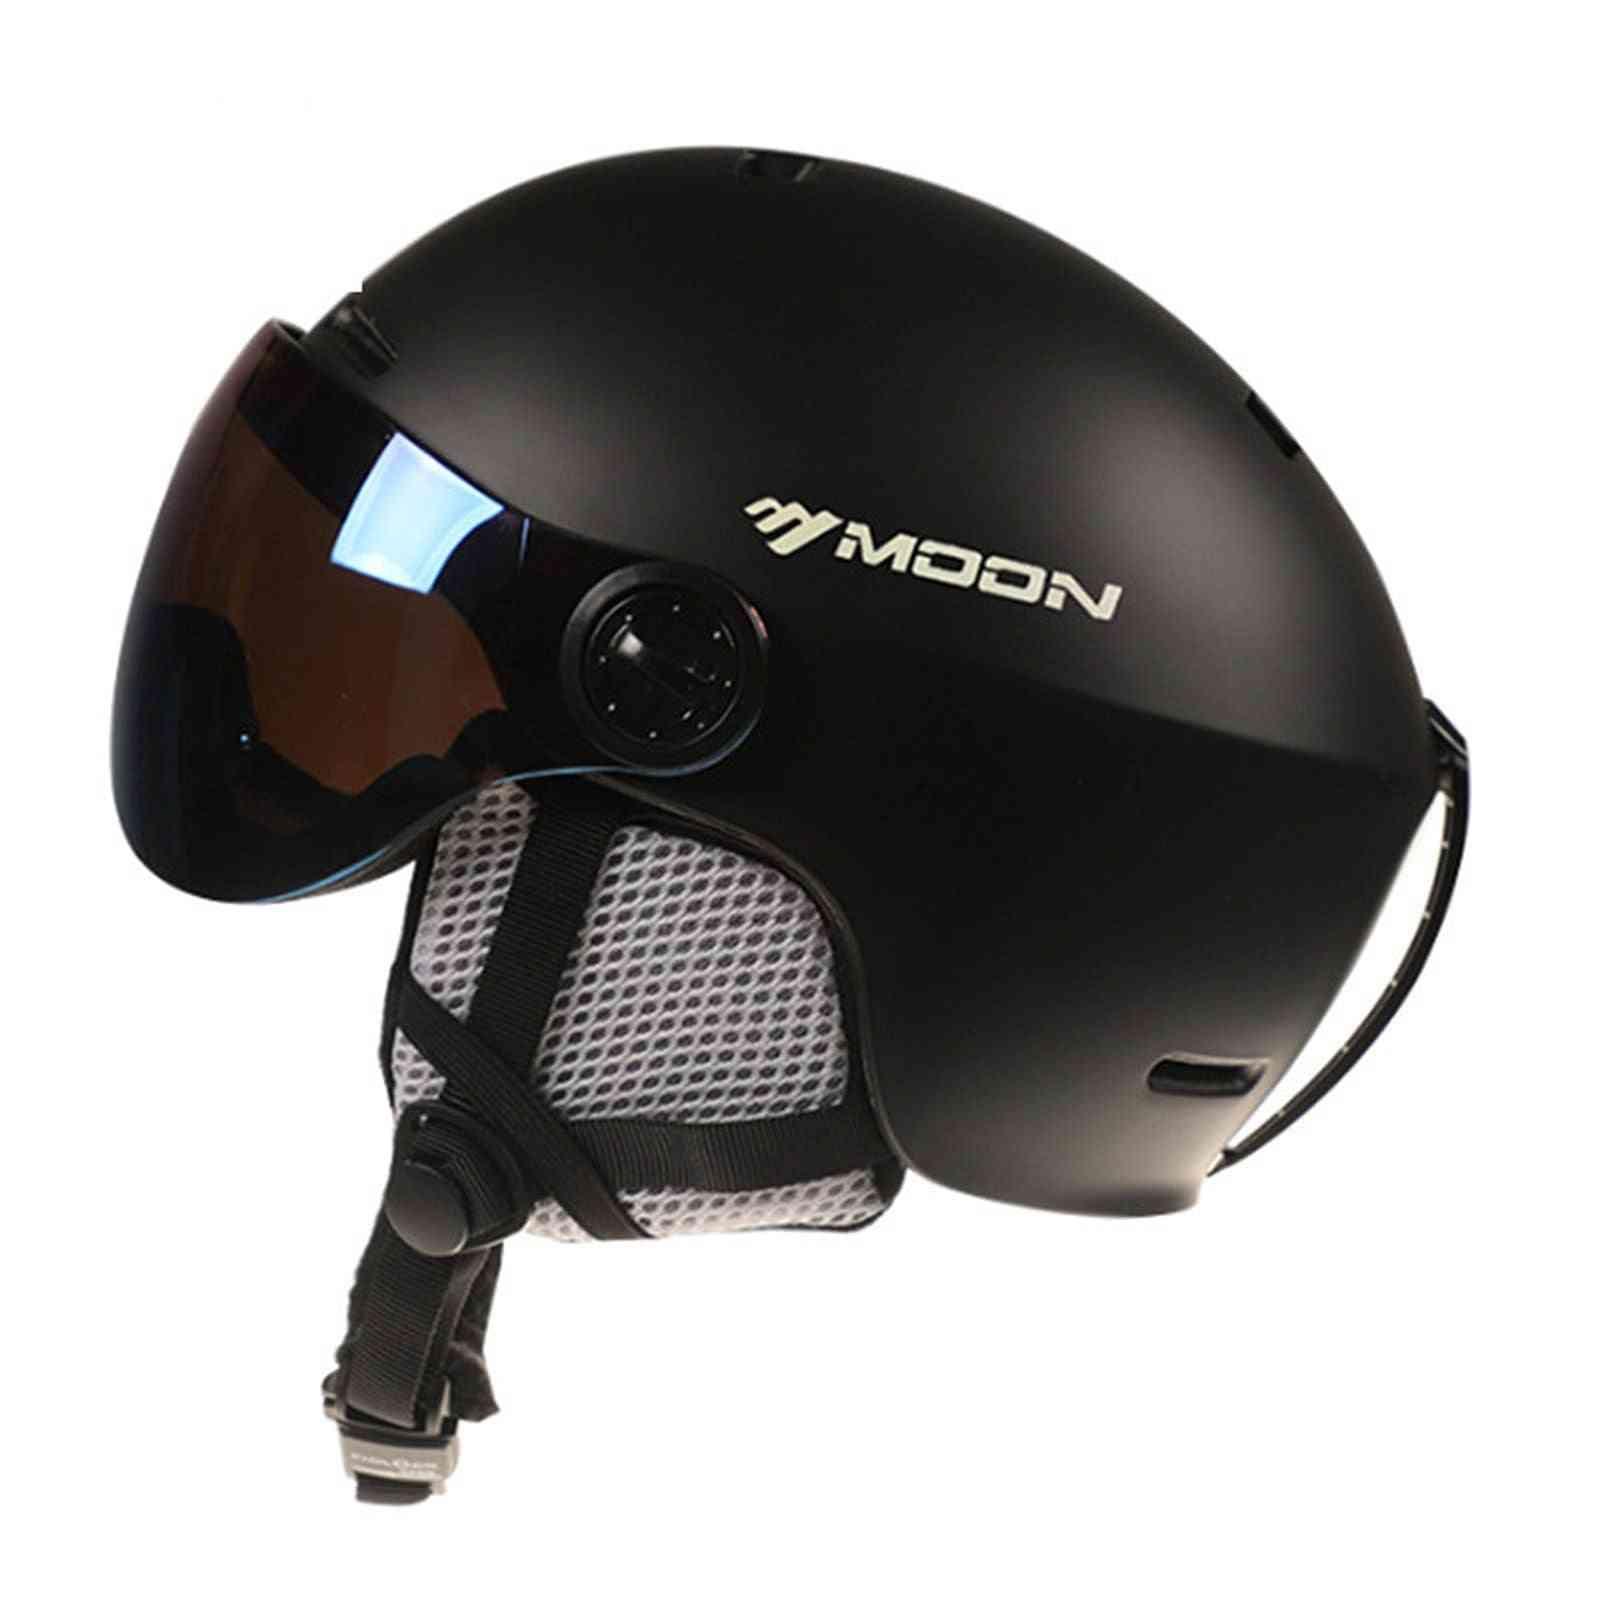 Winter Warm Snowboard Skiing Safety Sled Helmet